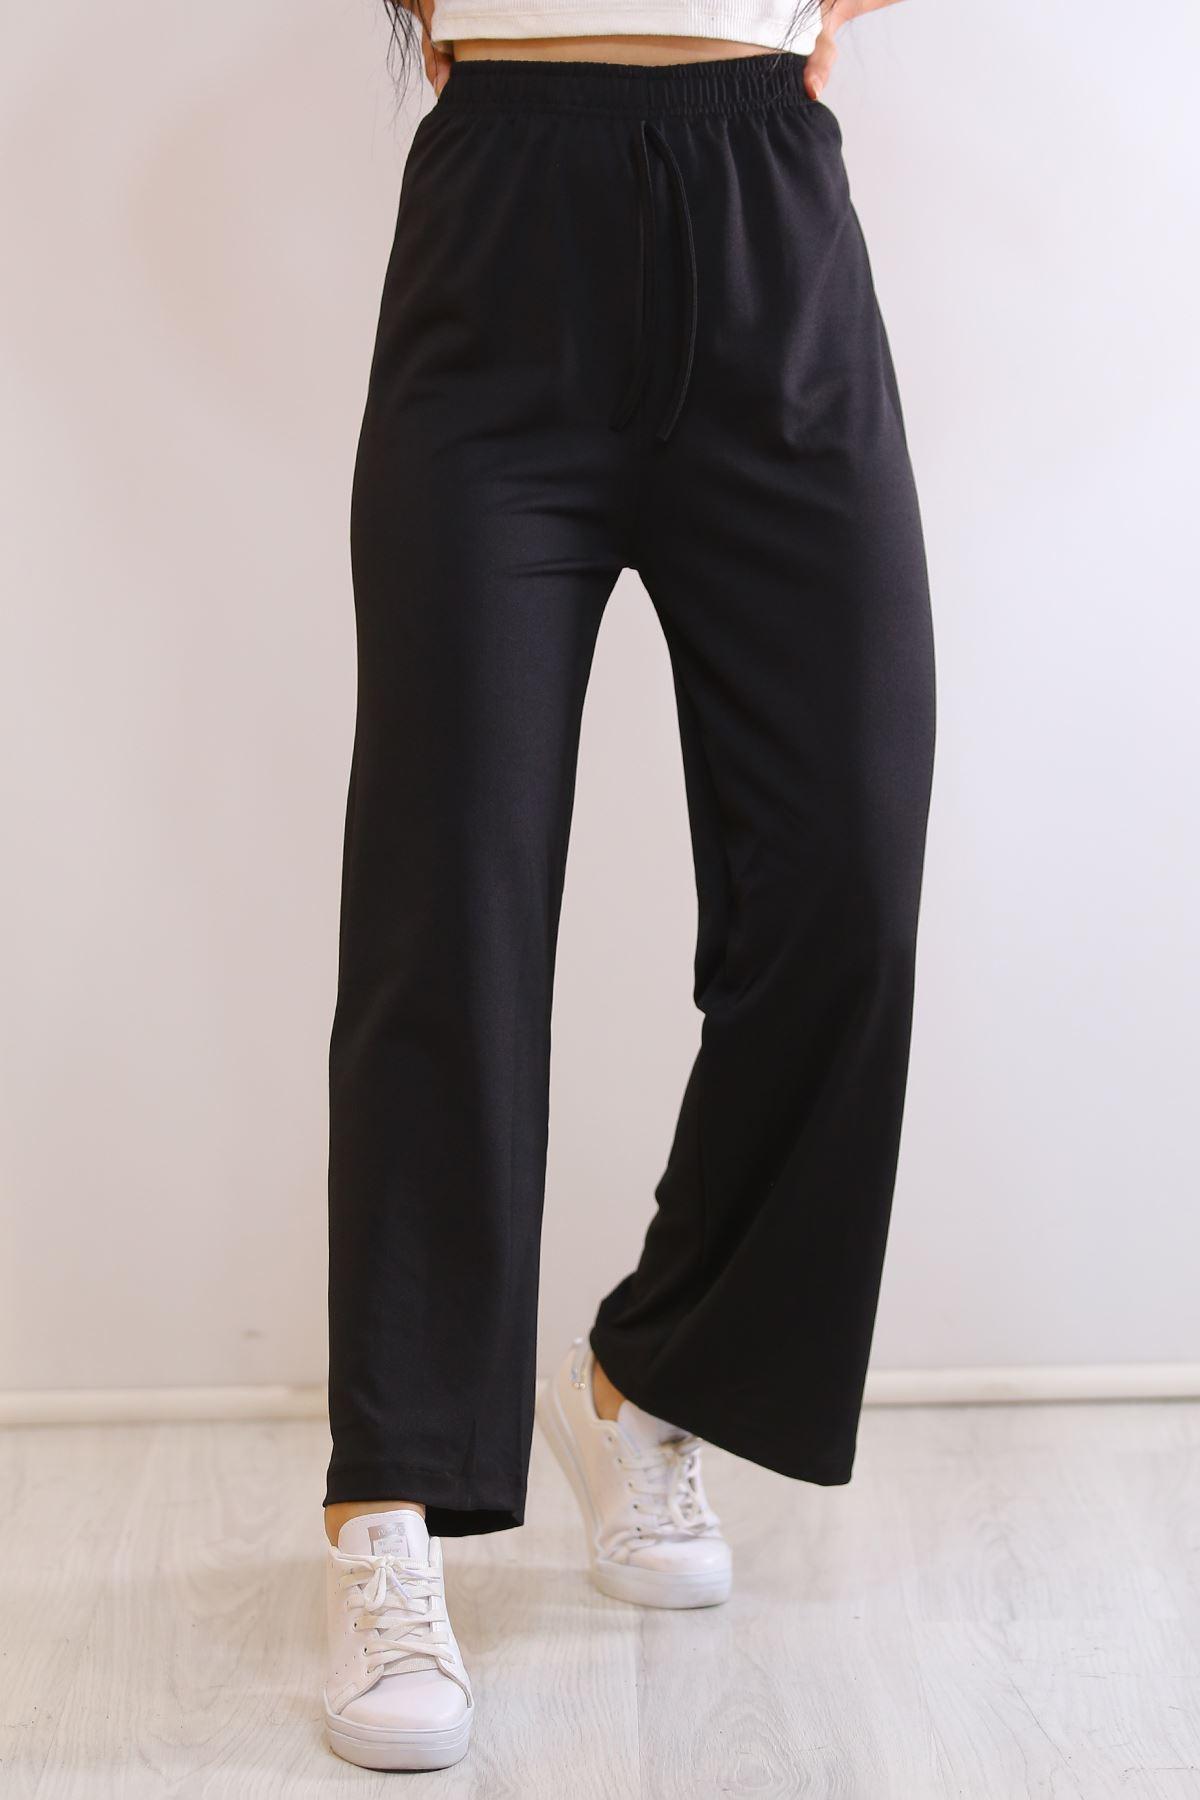 Örme Krep Pantolon Siyah - 19276.200.